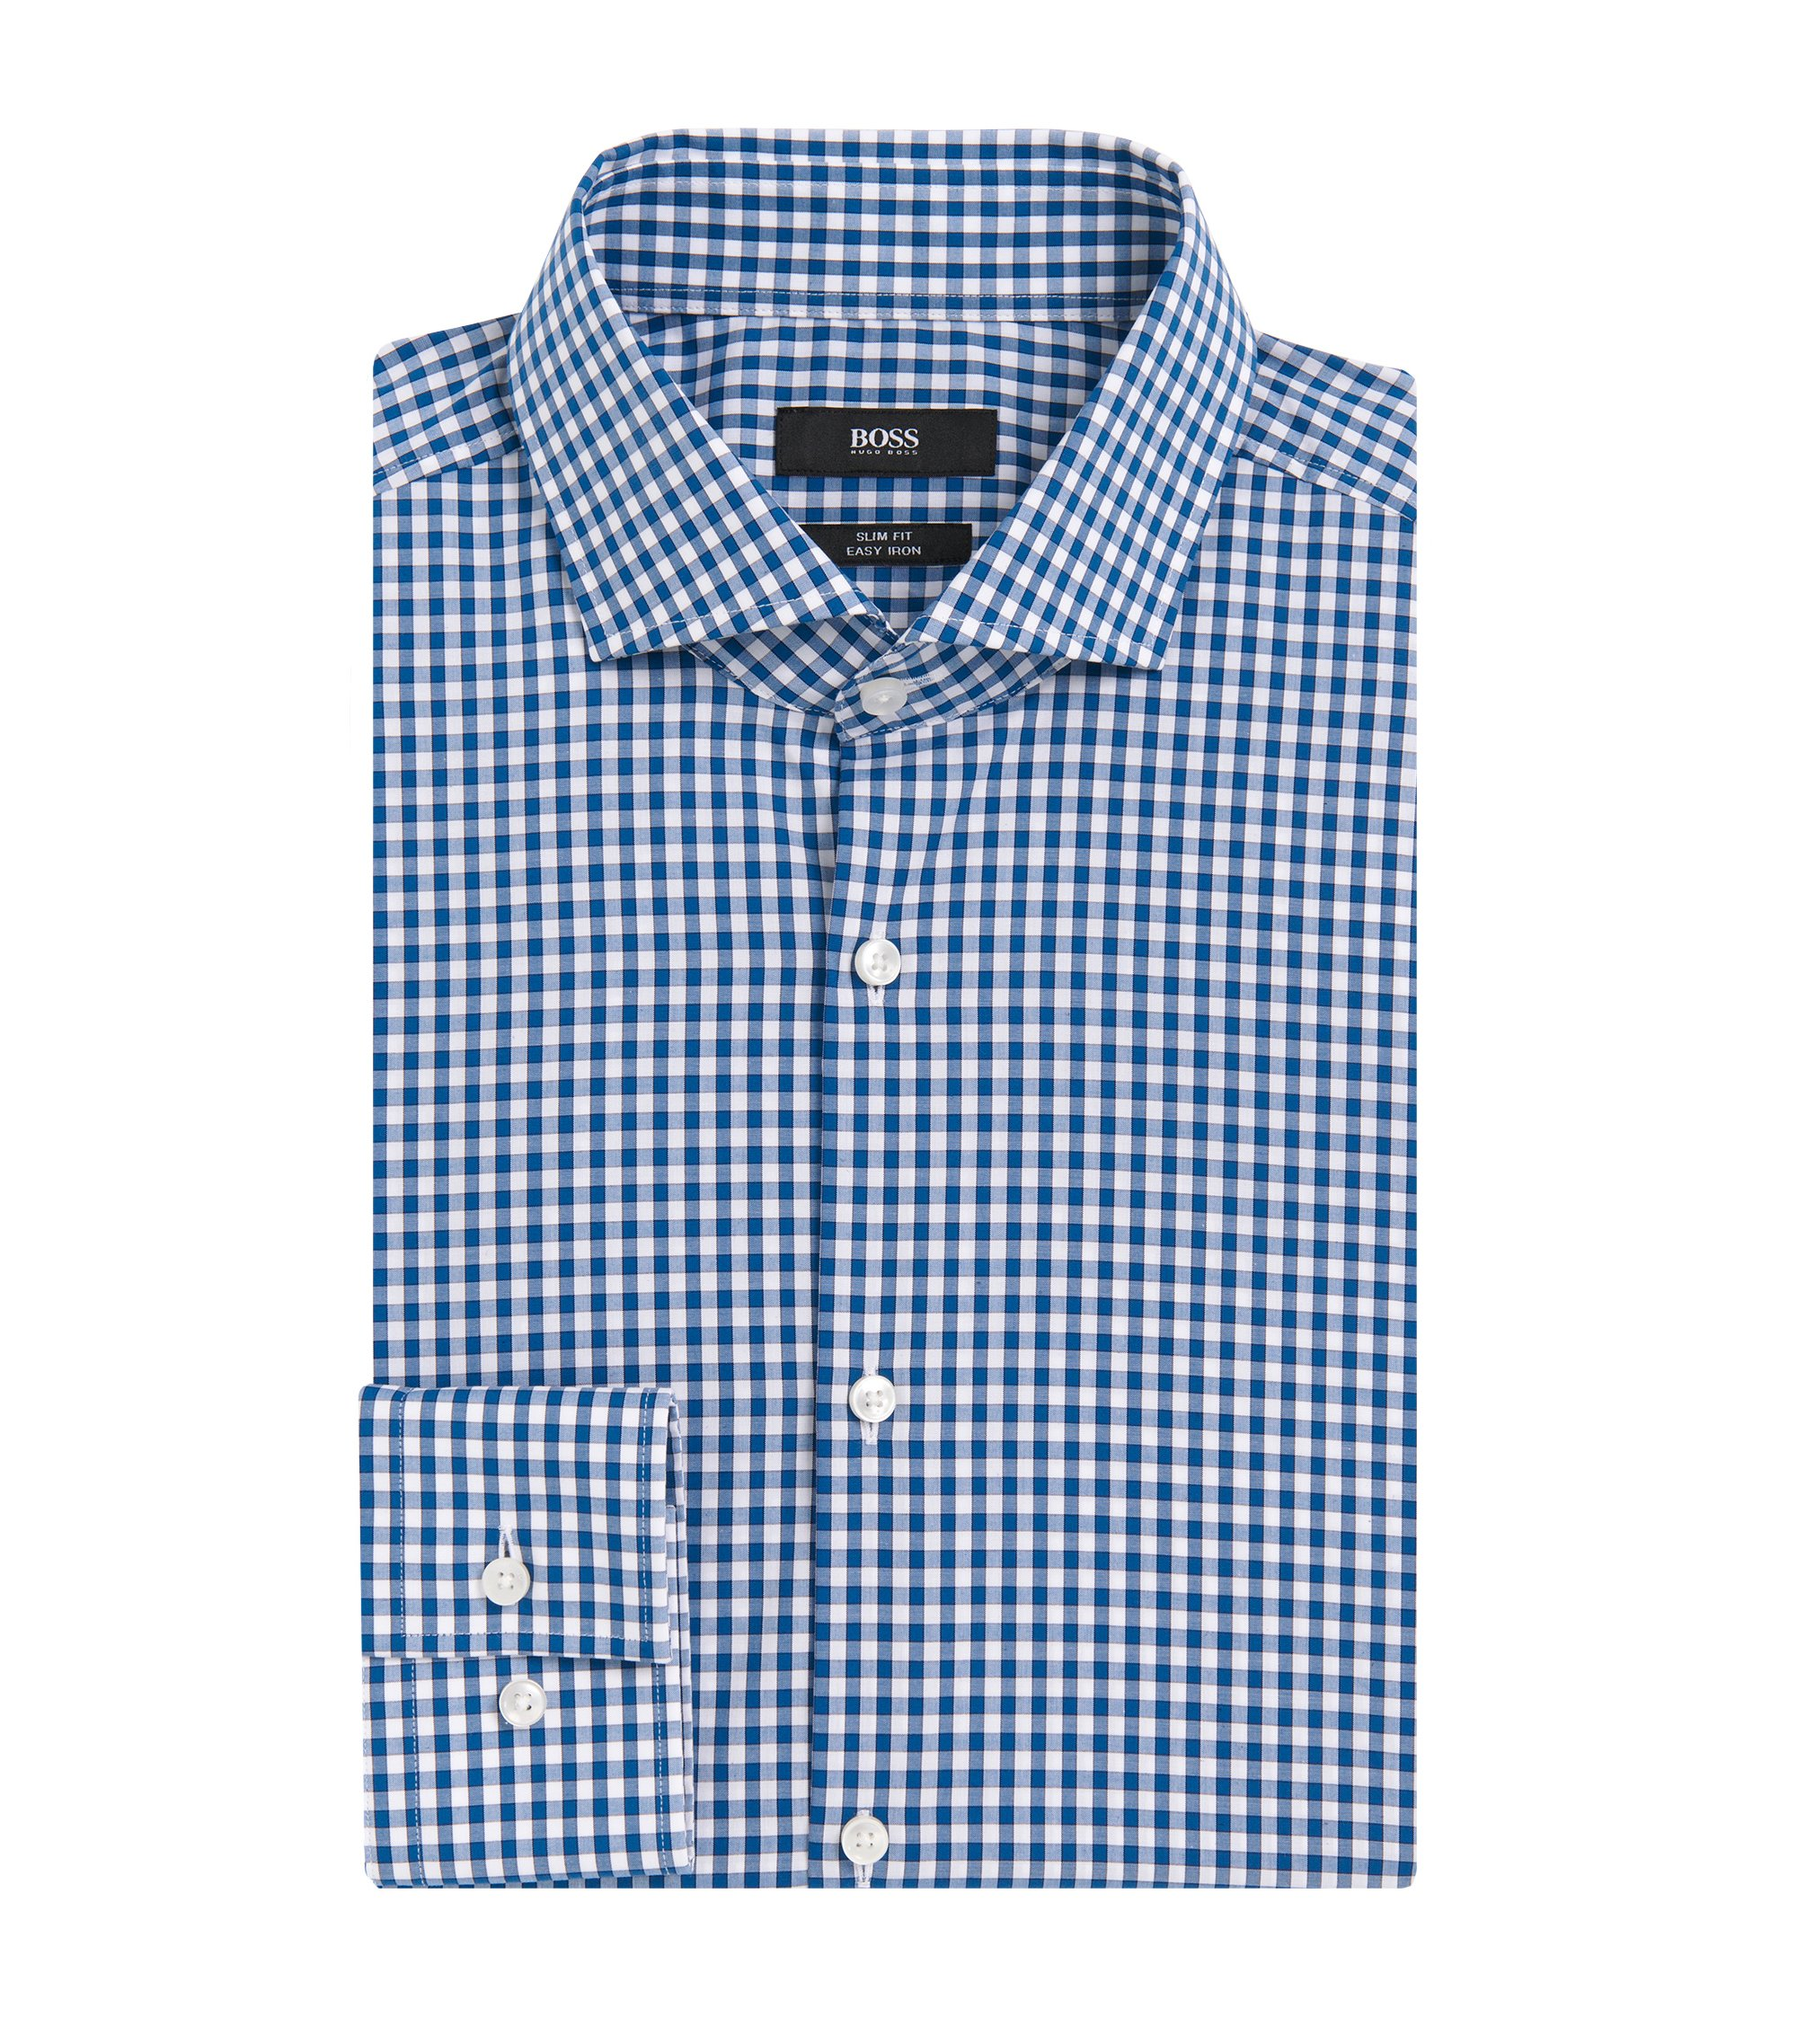 Gingham Cotton Dress Shirt, Slim Fit | Jason, Turquoise